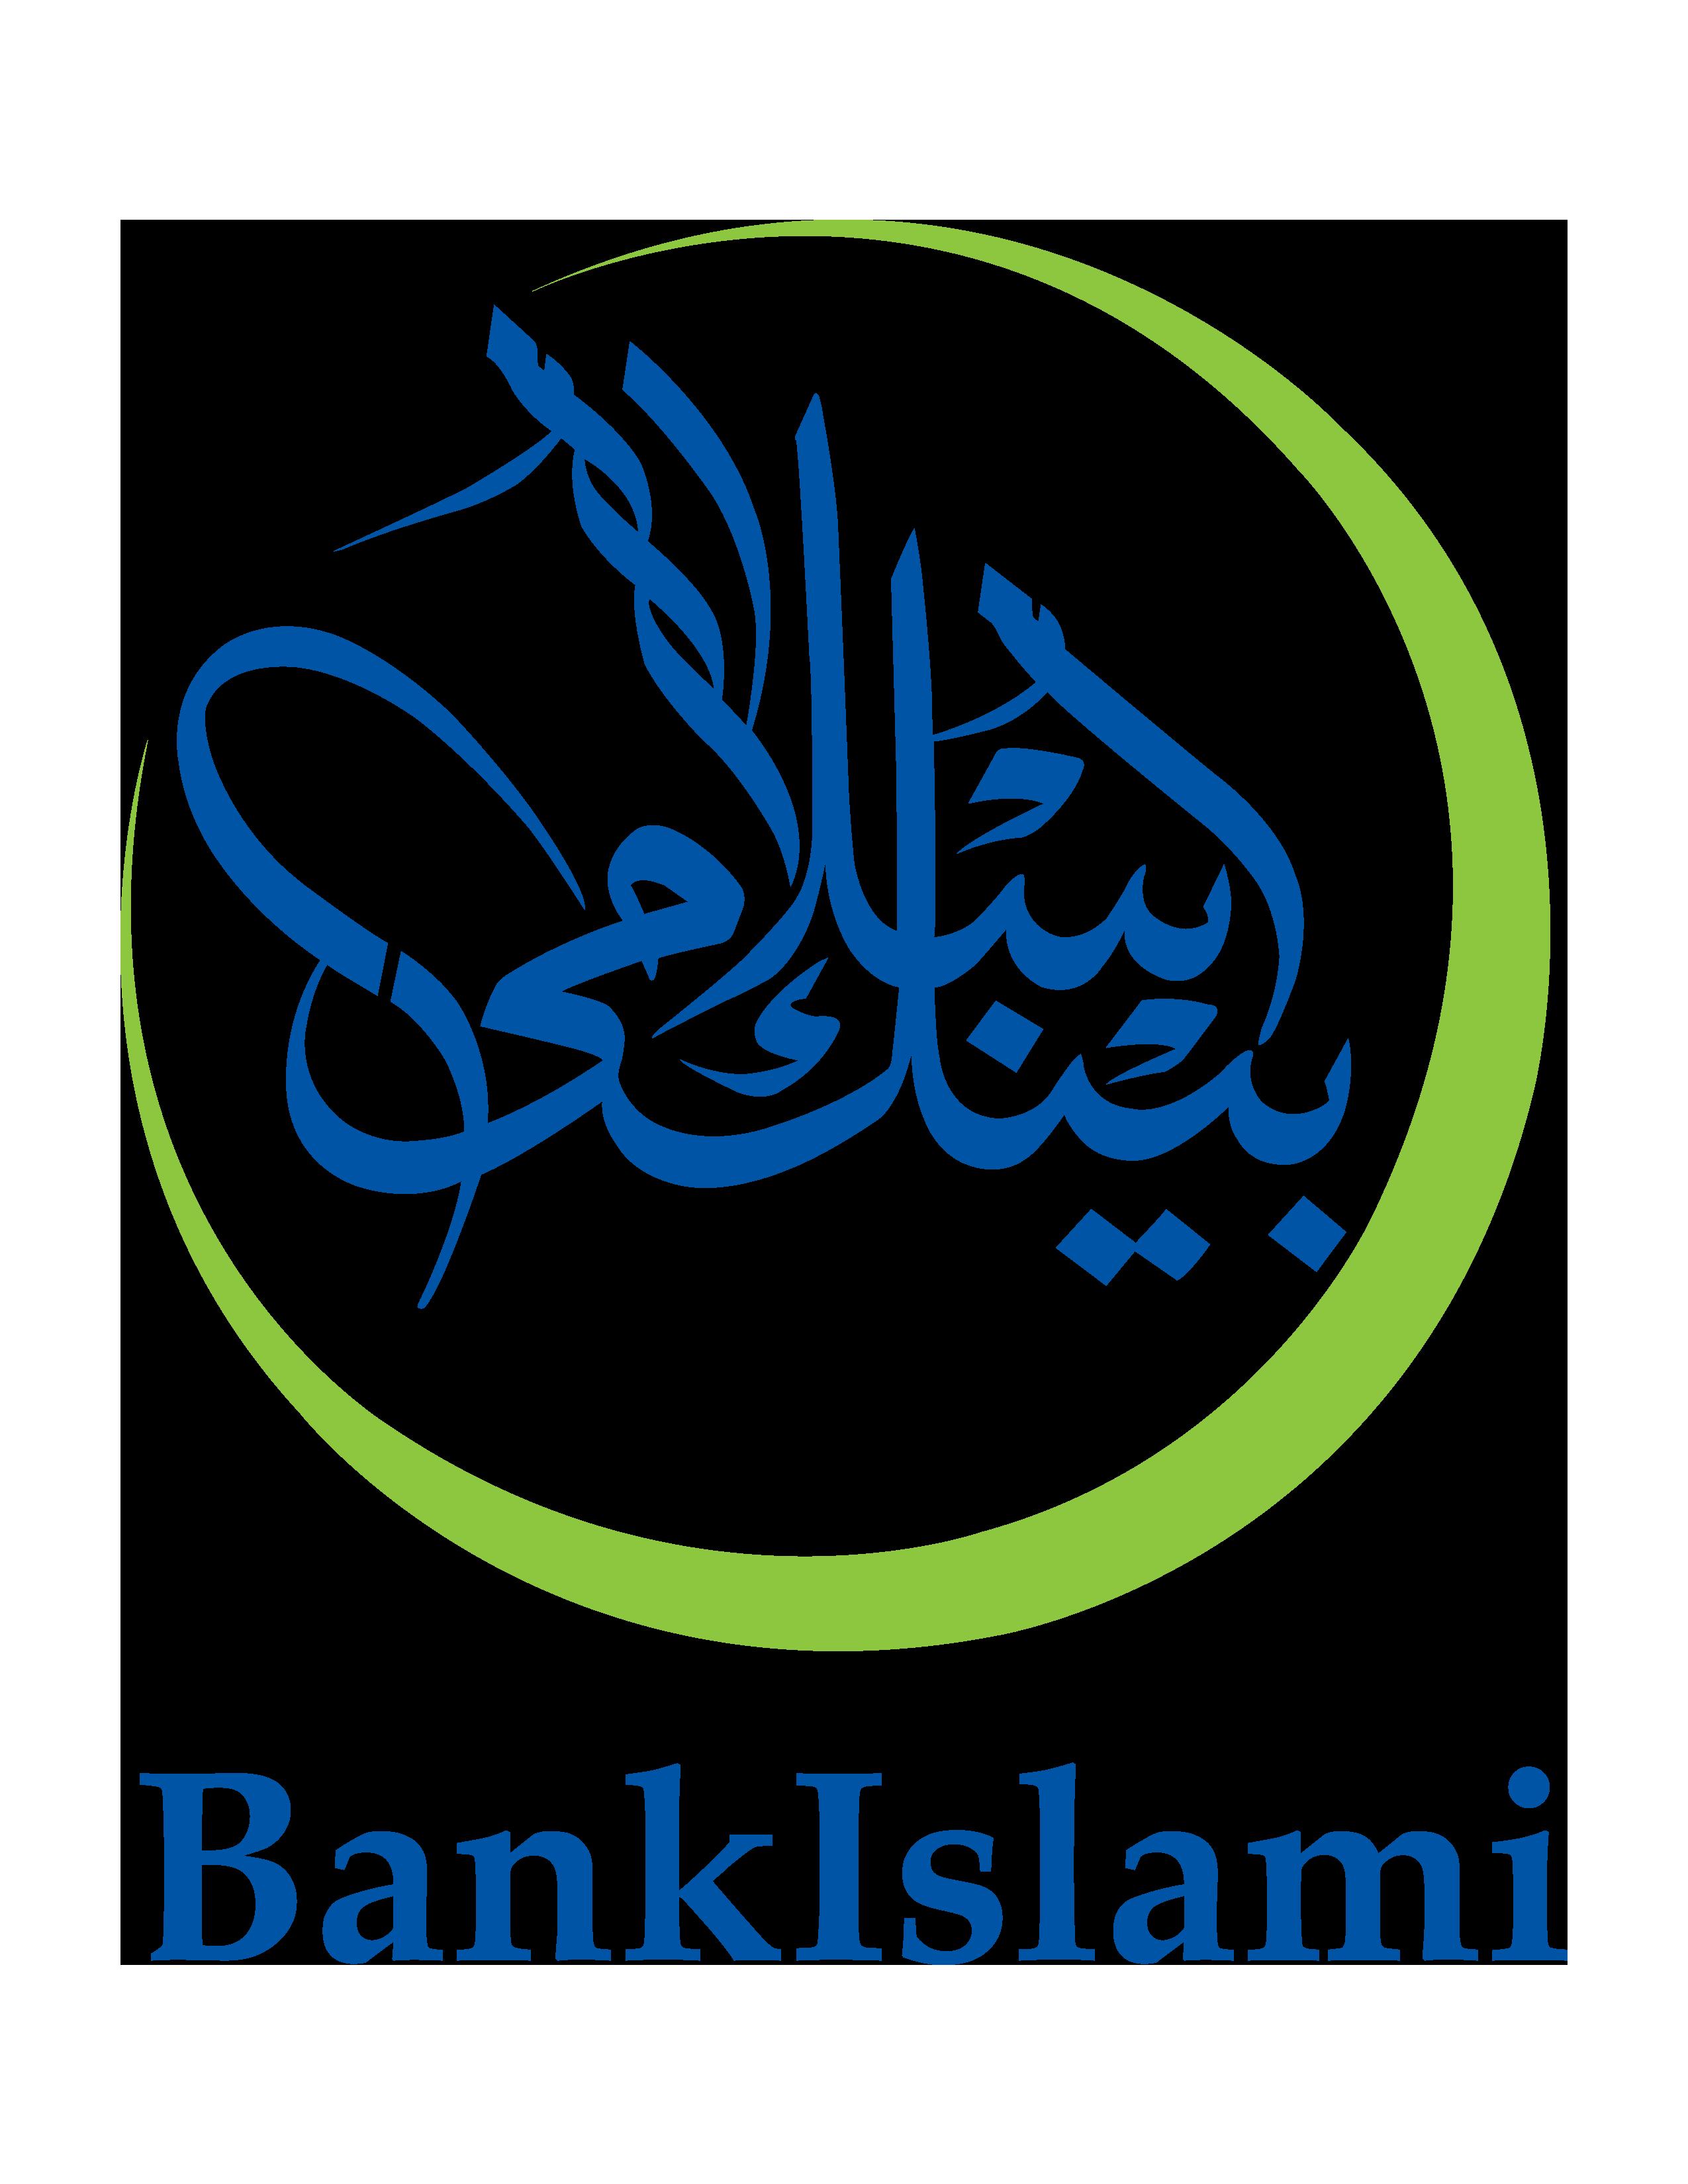 bankislami pakistan wikipedia bankislami pakistan wikipedia